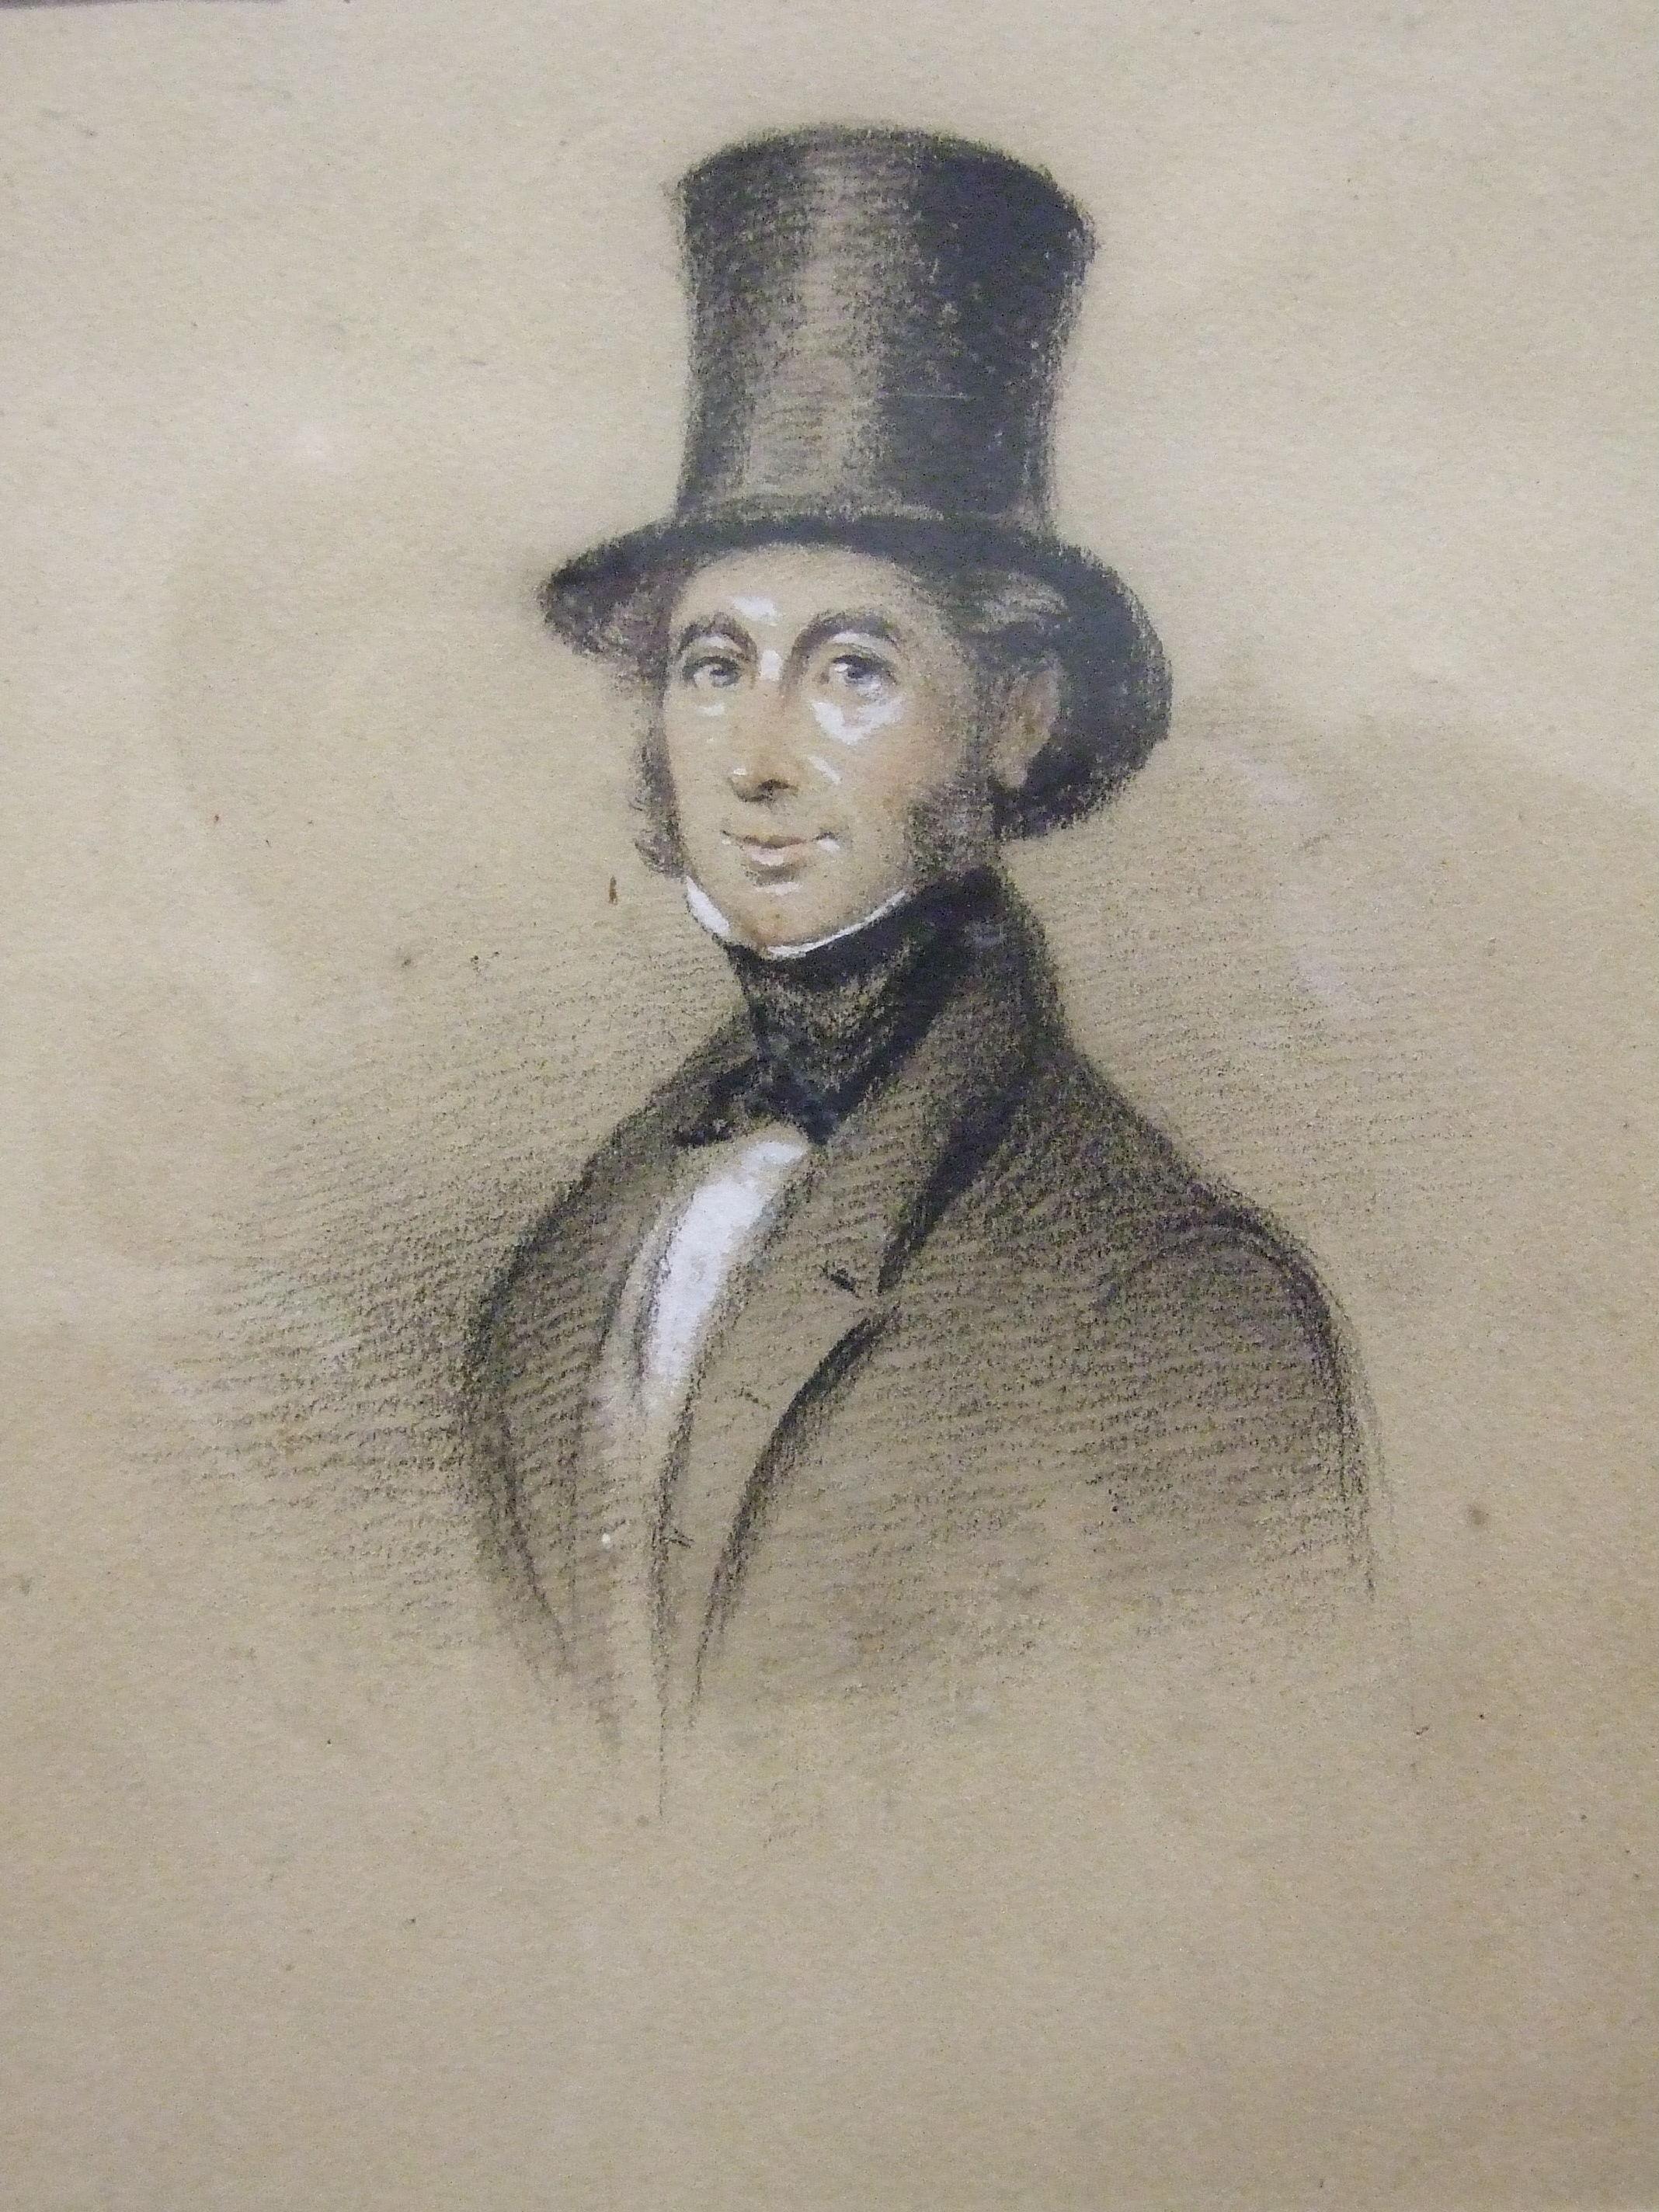 19th century Irish School HALF-LENGTH PORTRAIT OF NOBLE JOHNSON OF ROCKINGHAM, COUNTY CORK,